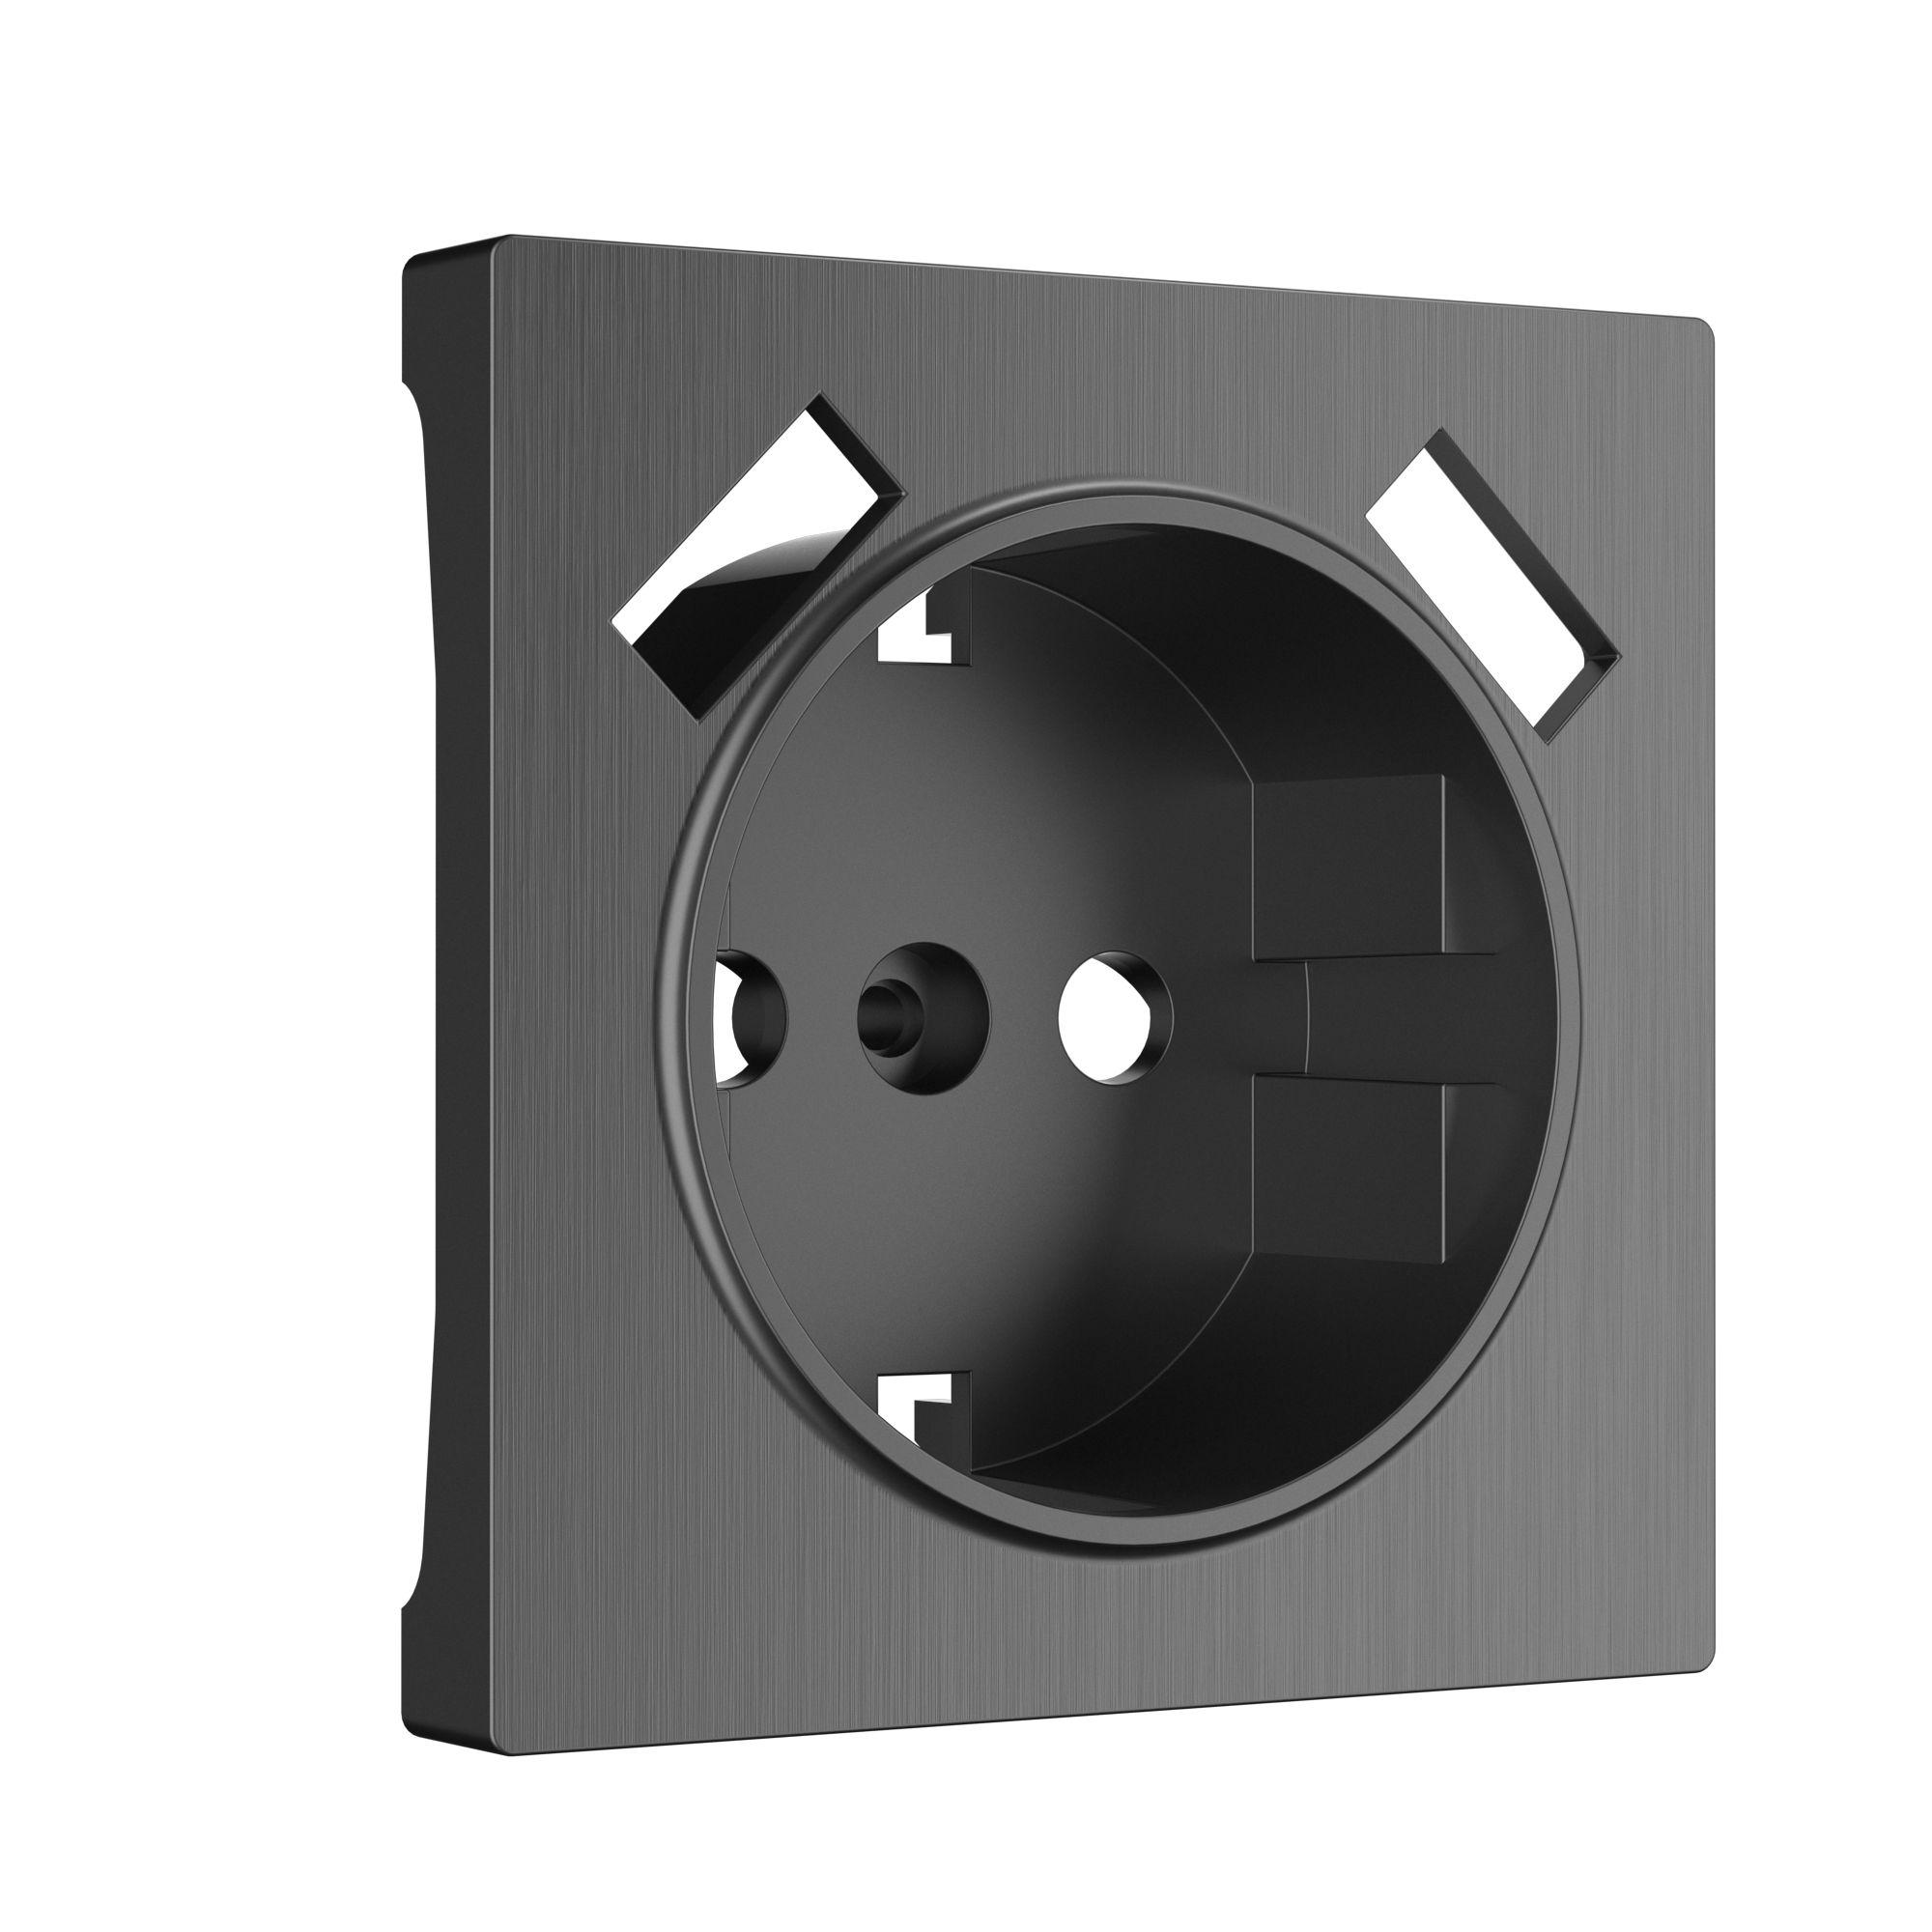 Накладка для розетки USB (графит рифленый) W1179504